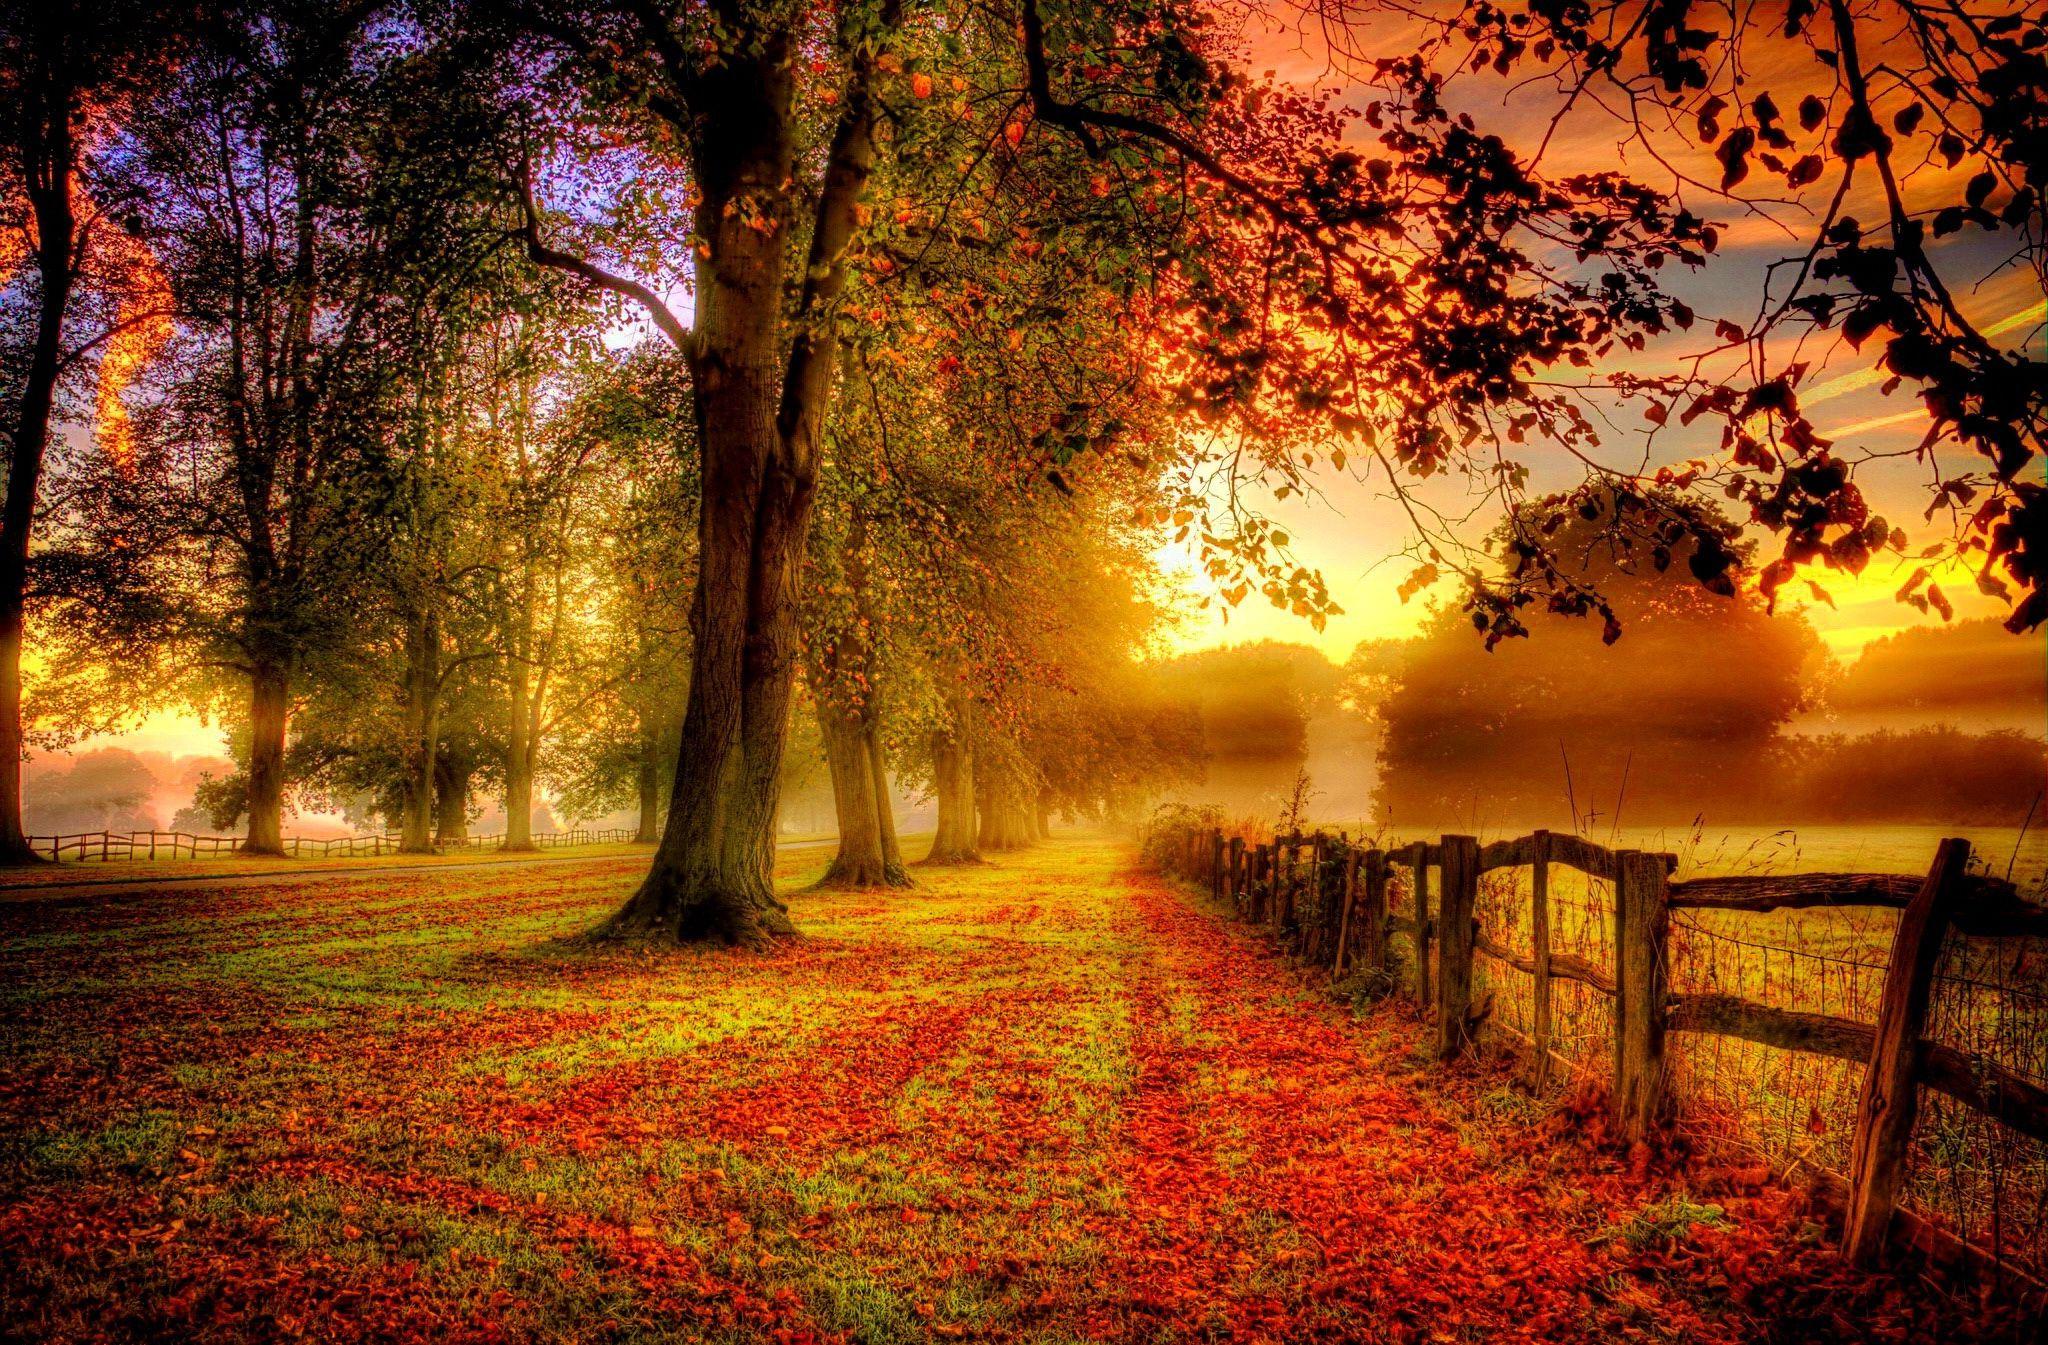 autumn-nature-landscape.jpg